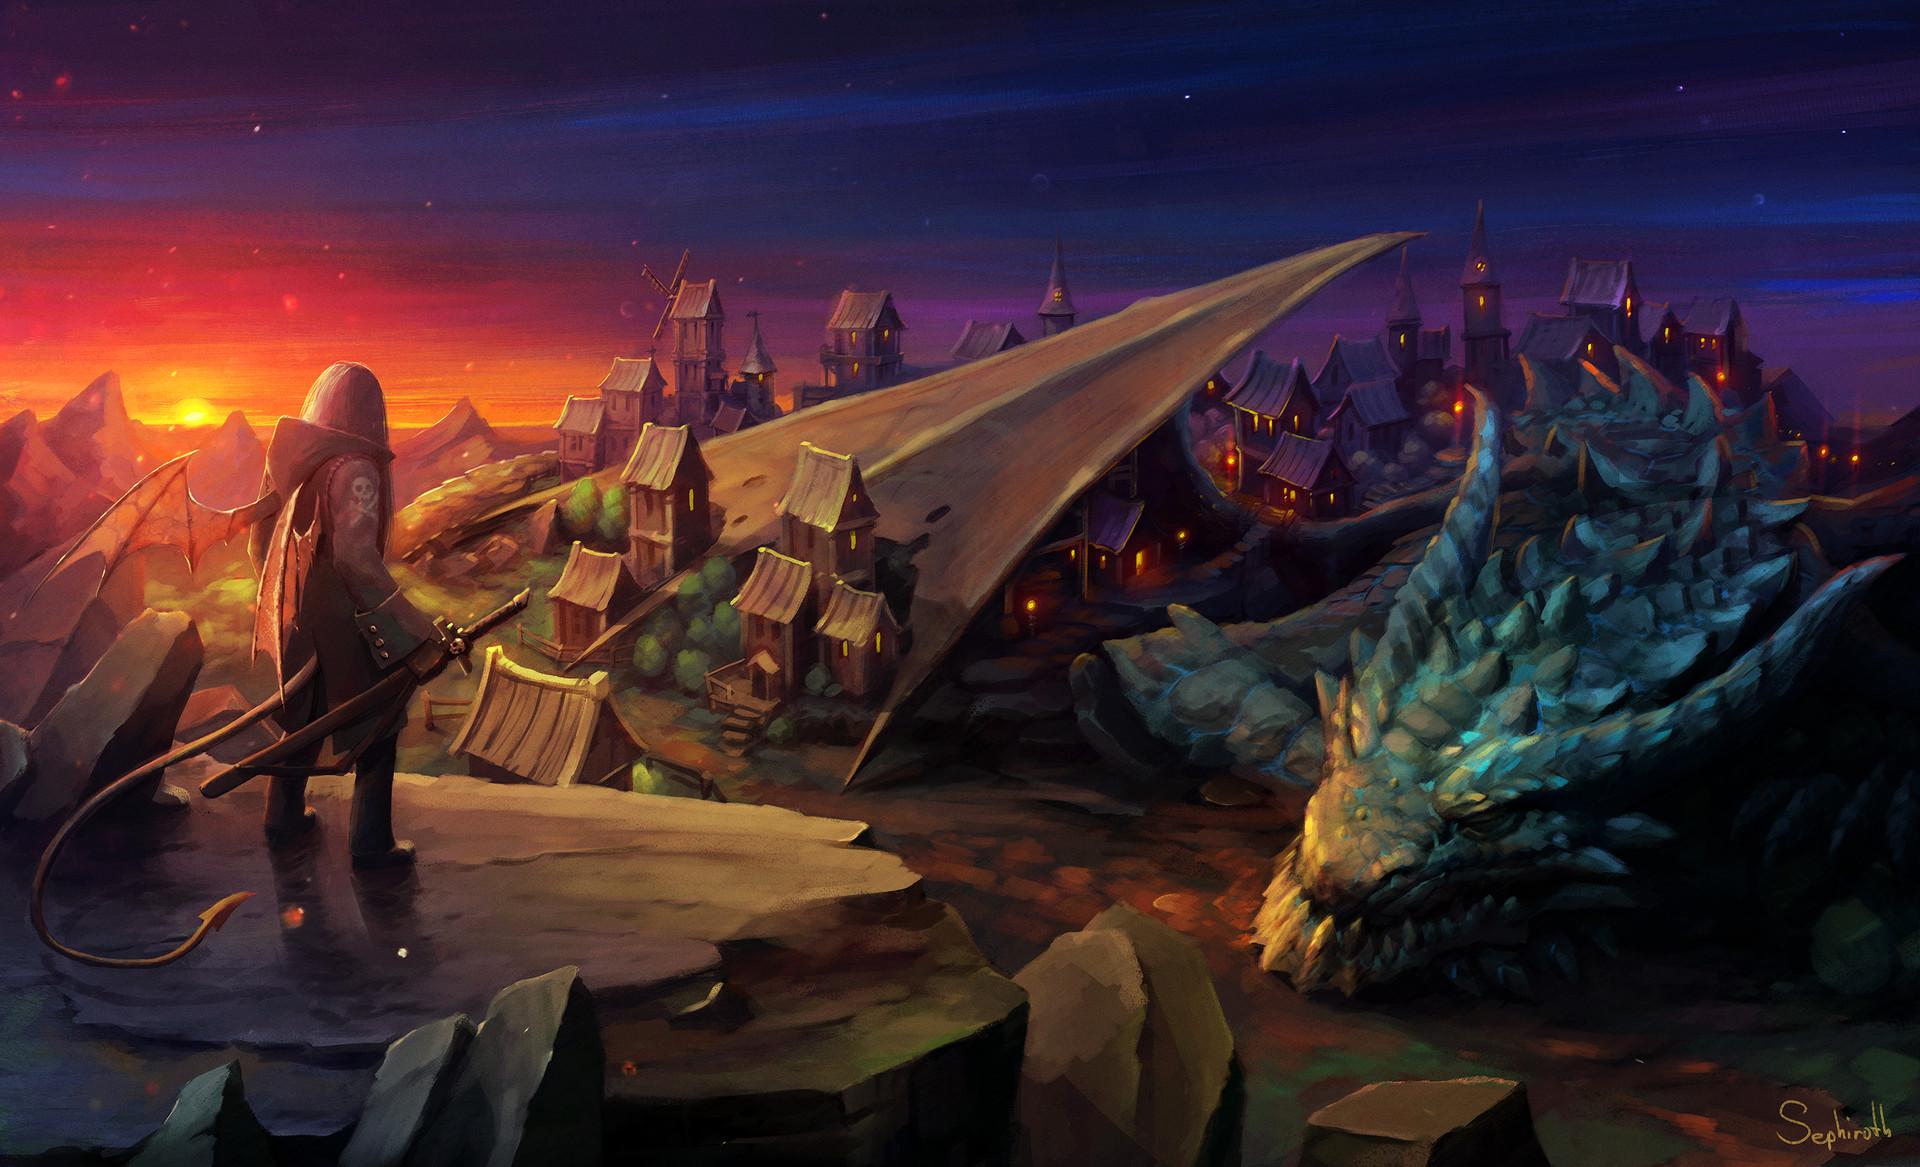 Sephiroth art 2d environment art challenge sephirothart